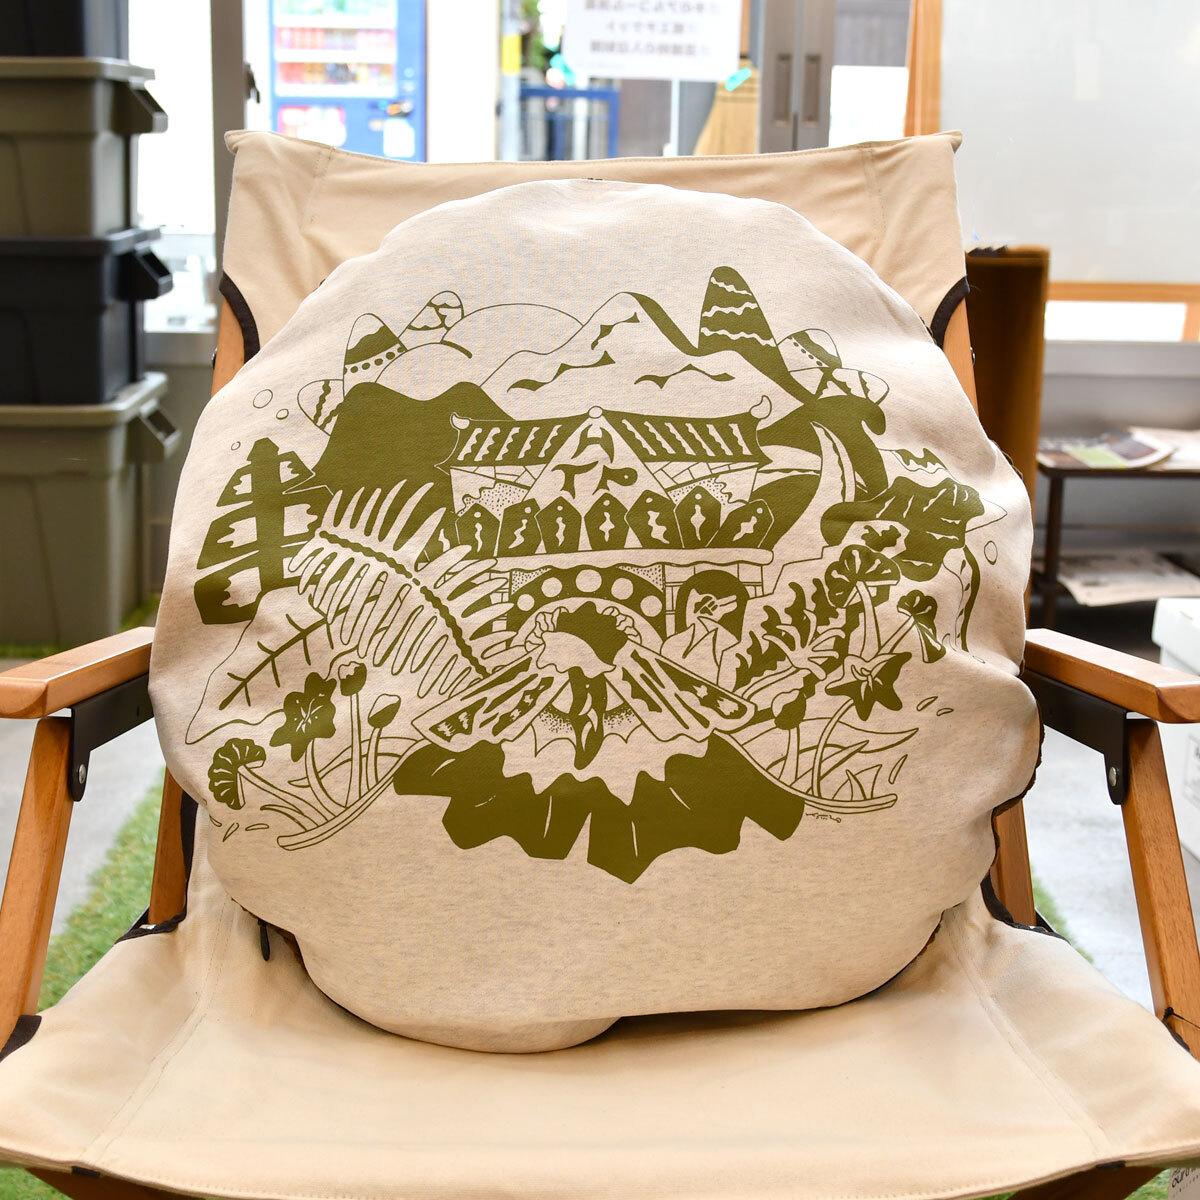 HALF TRACK PRODUCTS nonsleep cushion 58 ハーフトラックプロダクツ ノンスリープクッション58